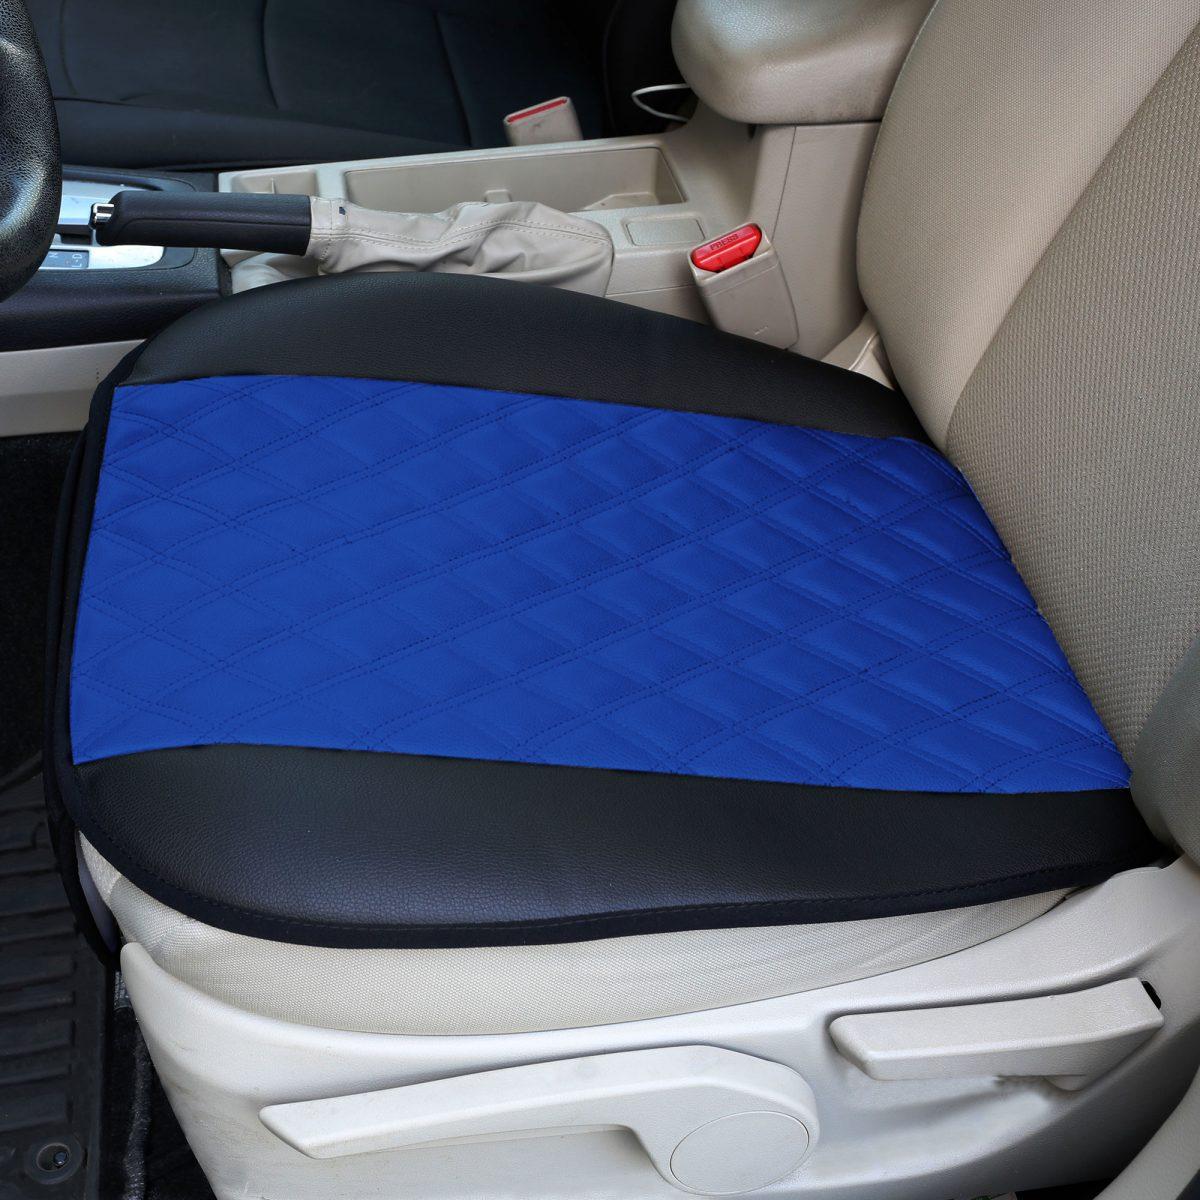 Faux Leather Seat Cushion Pad w/ Front Pocket – Front Set blue color